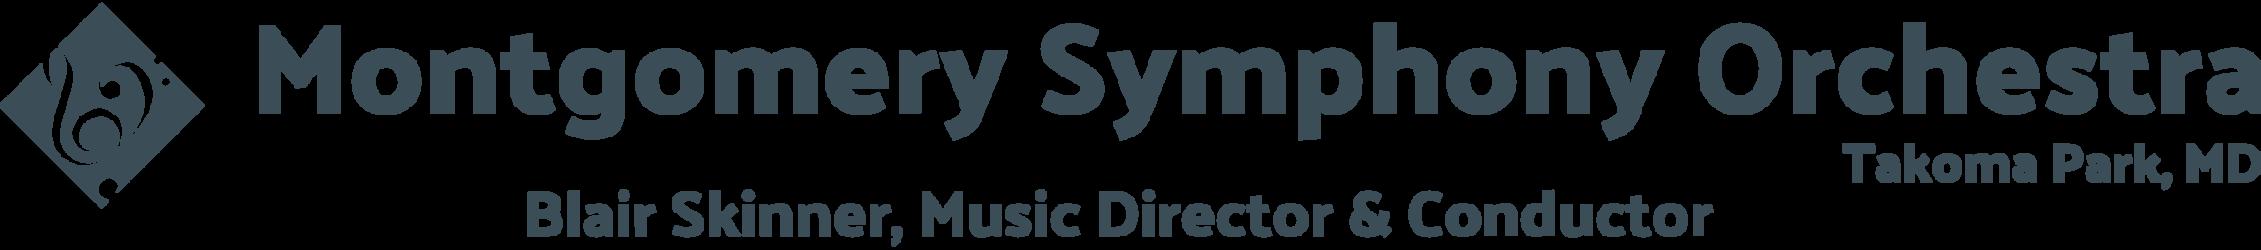 Montgomery Symphony Orchestra